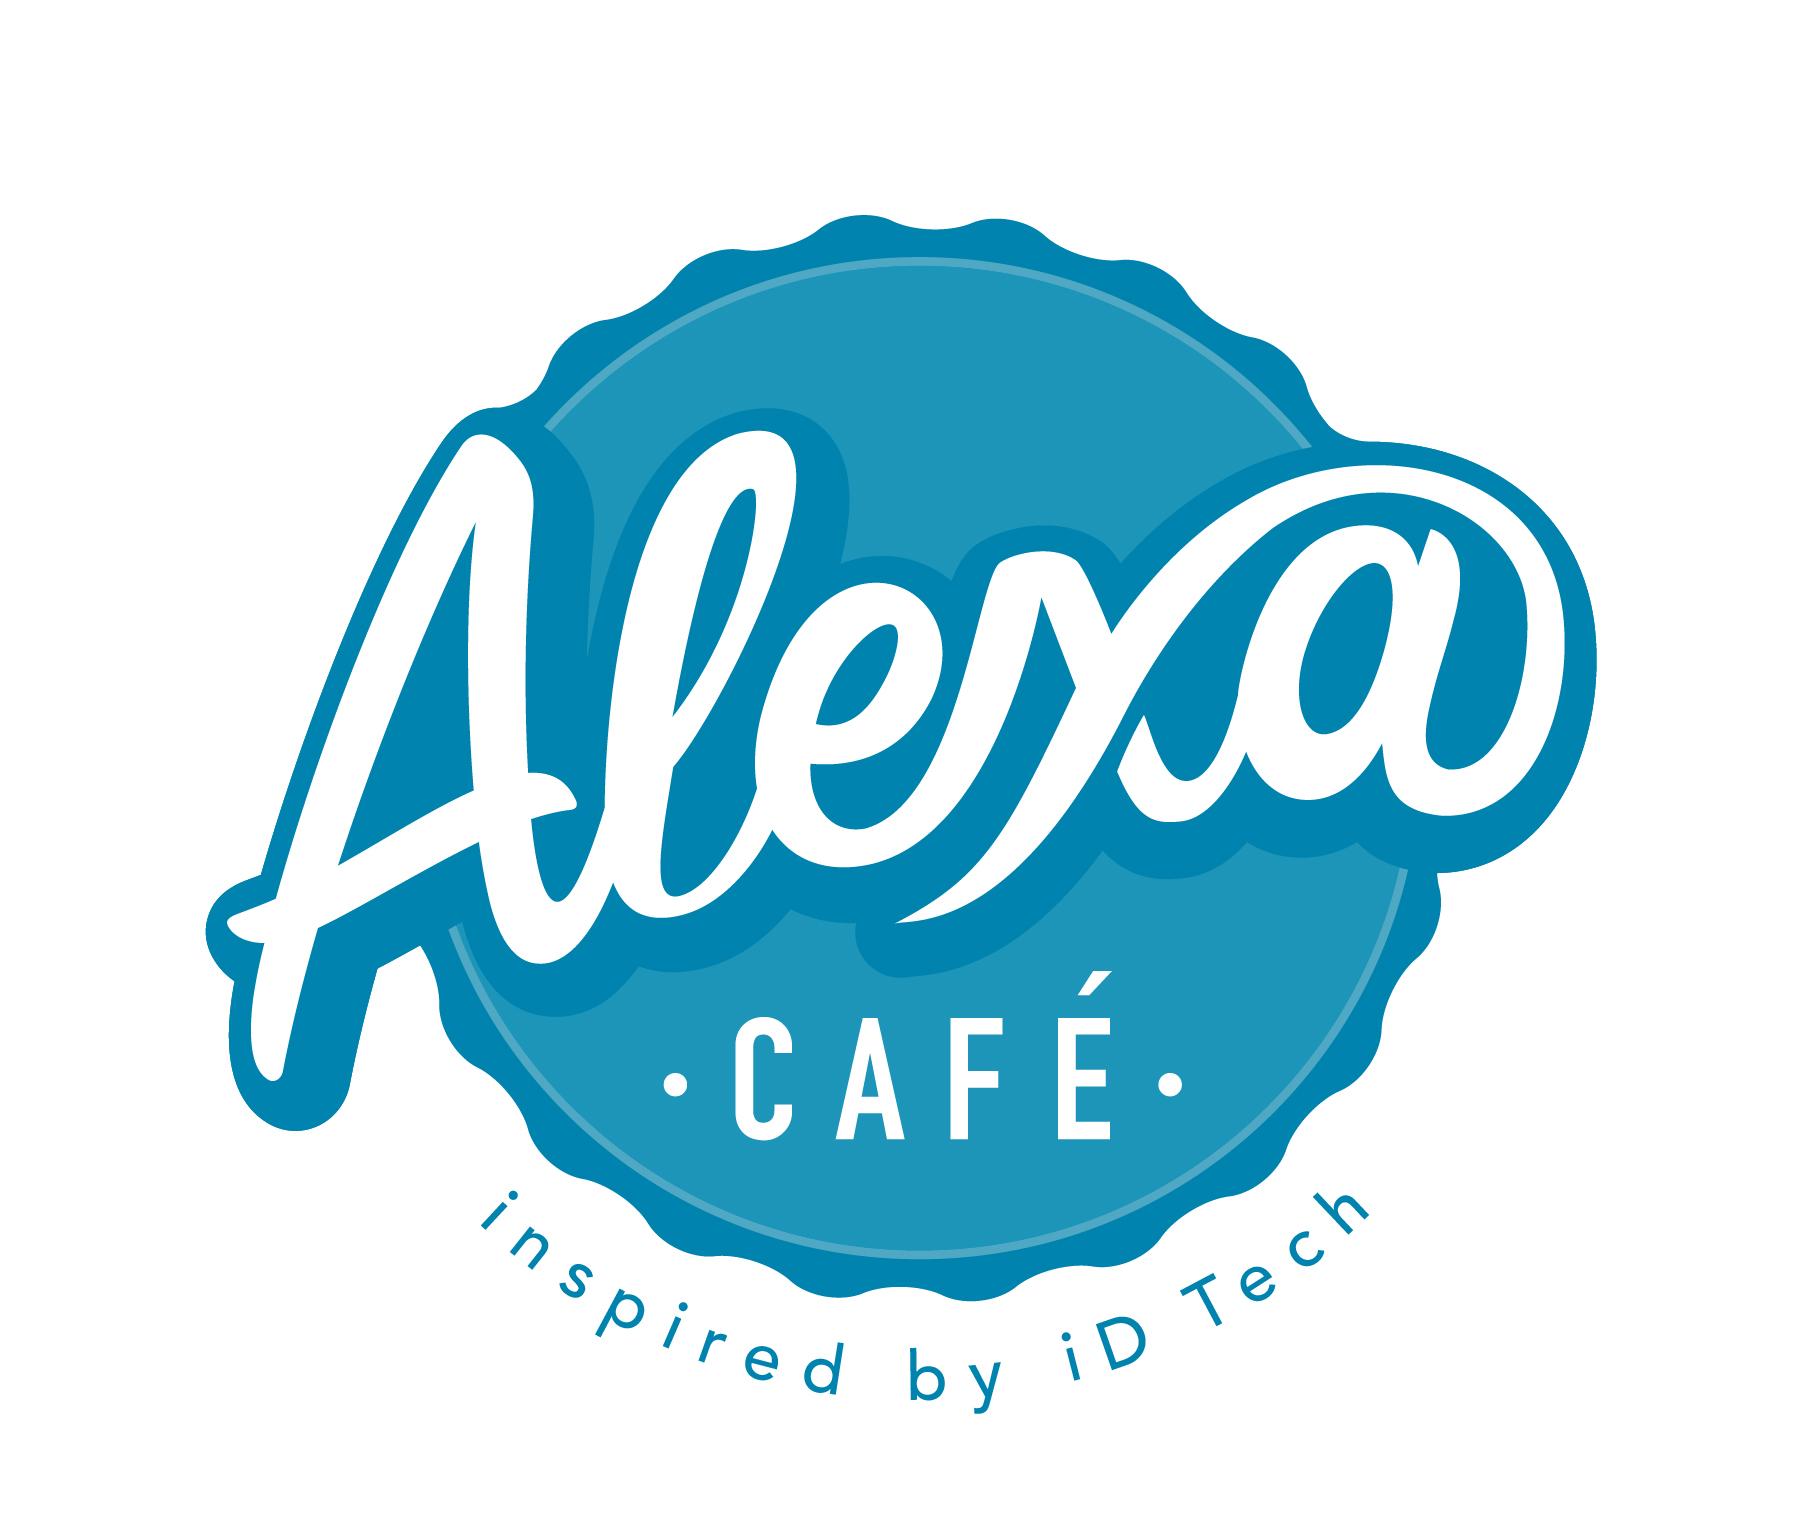 Alexa-Cafe-Logo-Circle.jpg